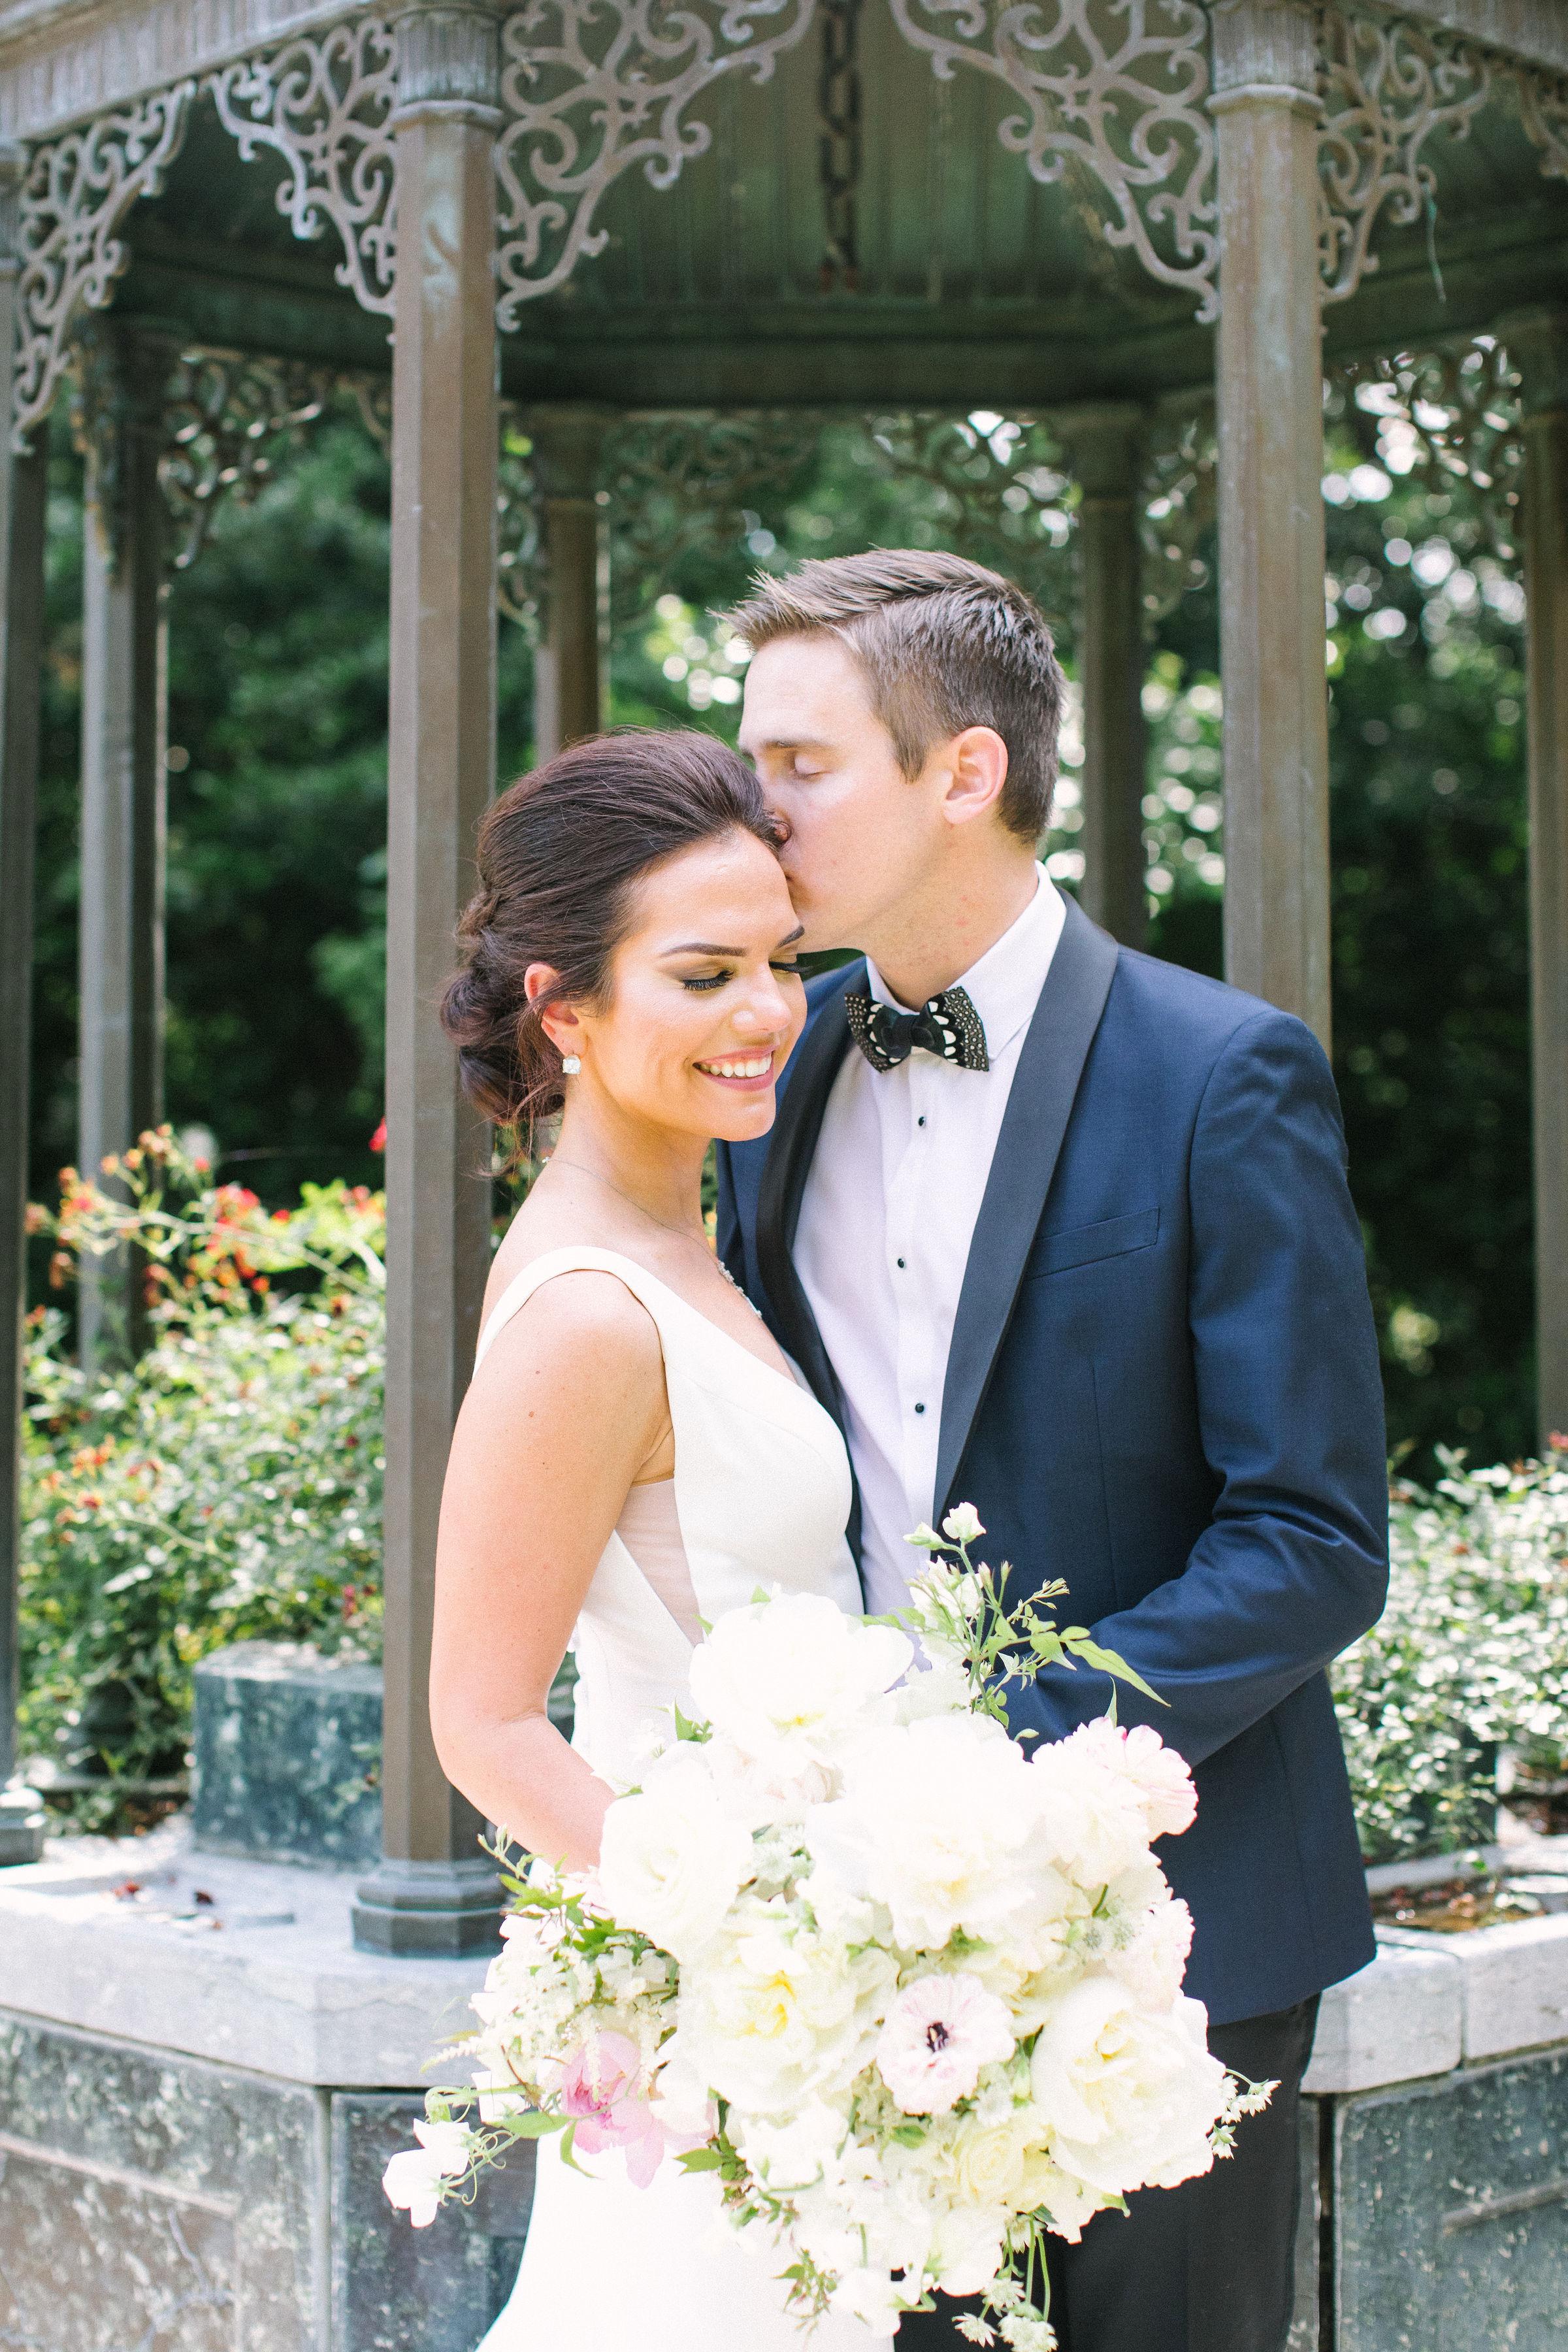 Ellen-Ashton-Photography-Dallas-Wedding-Photographers-Ivory-and-vine-Weddings-238.jpg